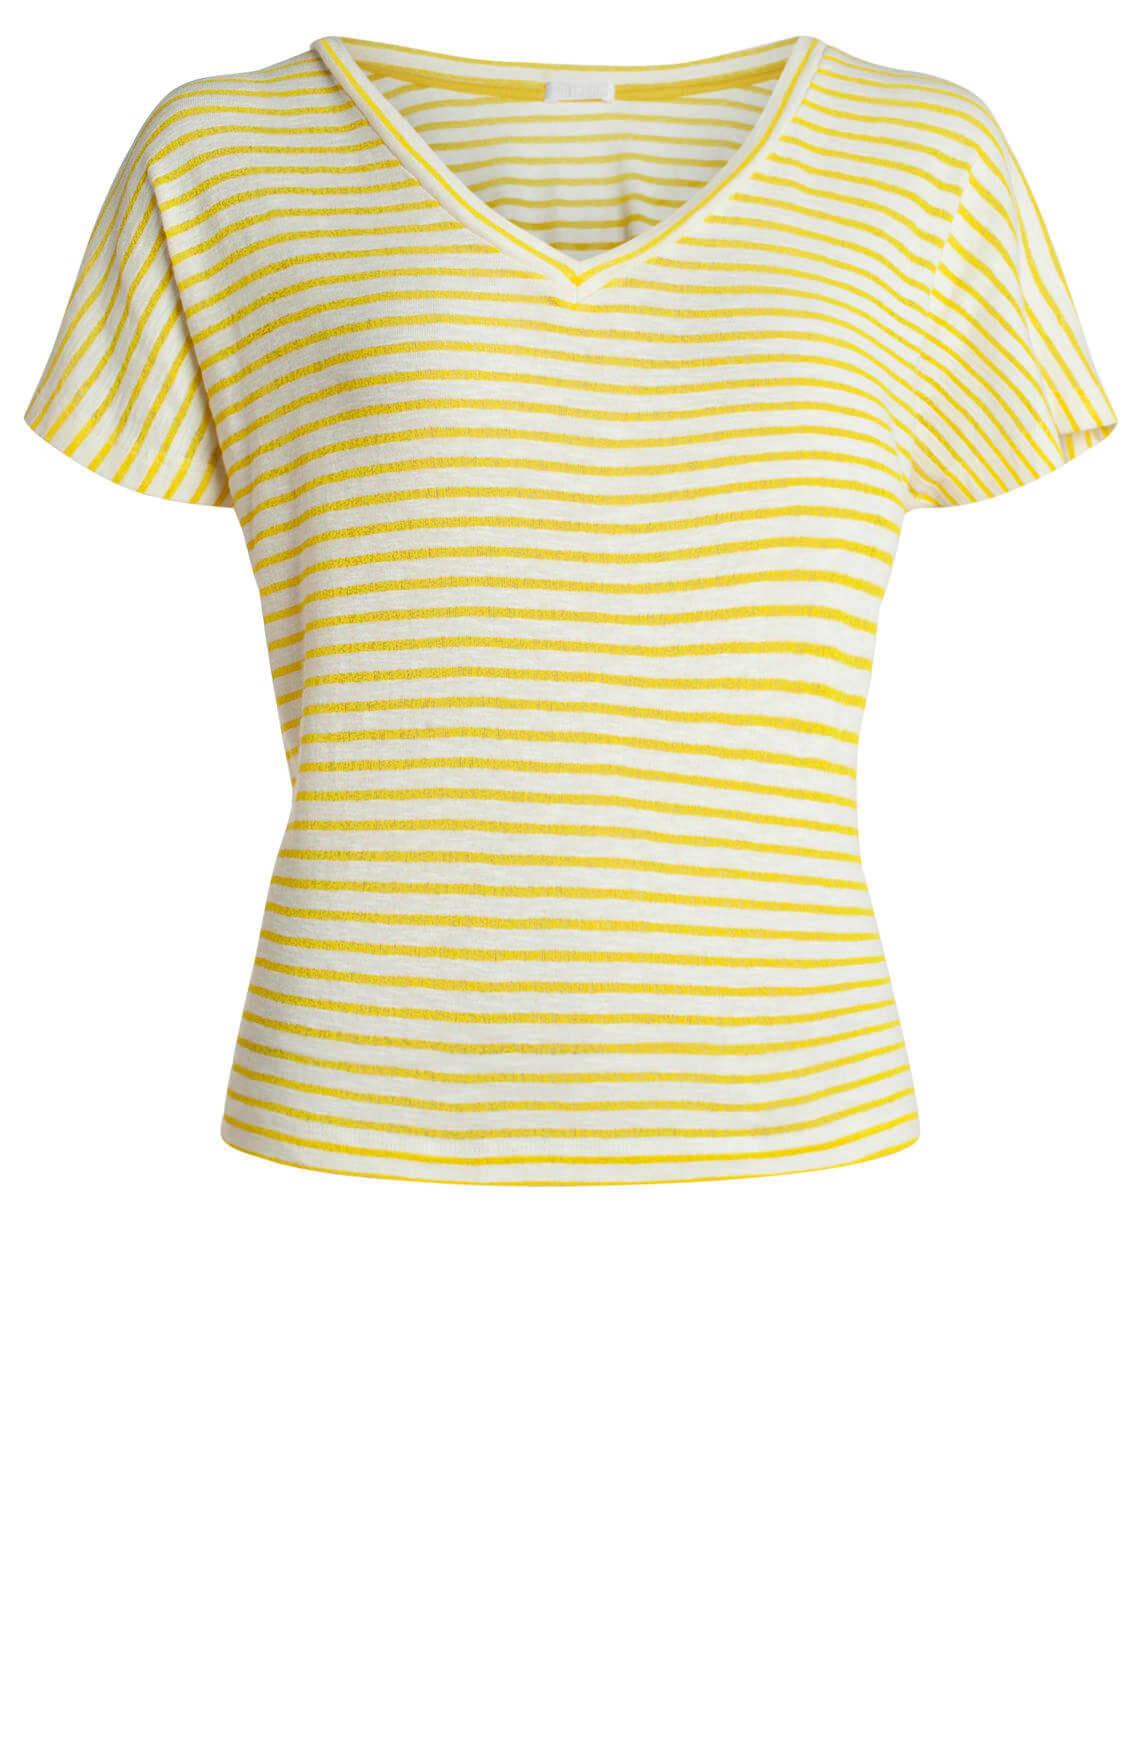 Drykorn Dames Svana gestreept shirt geel